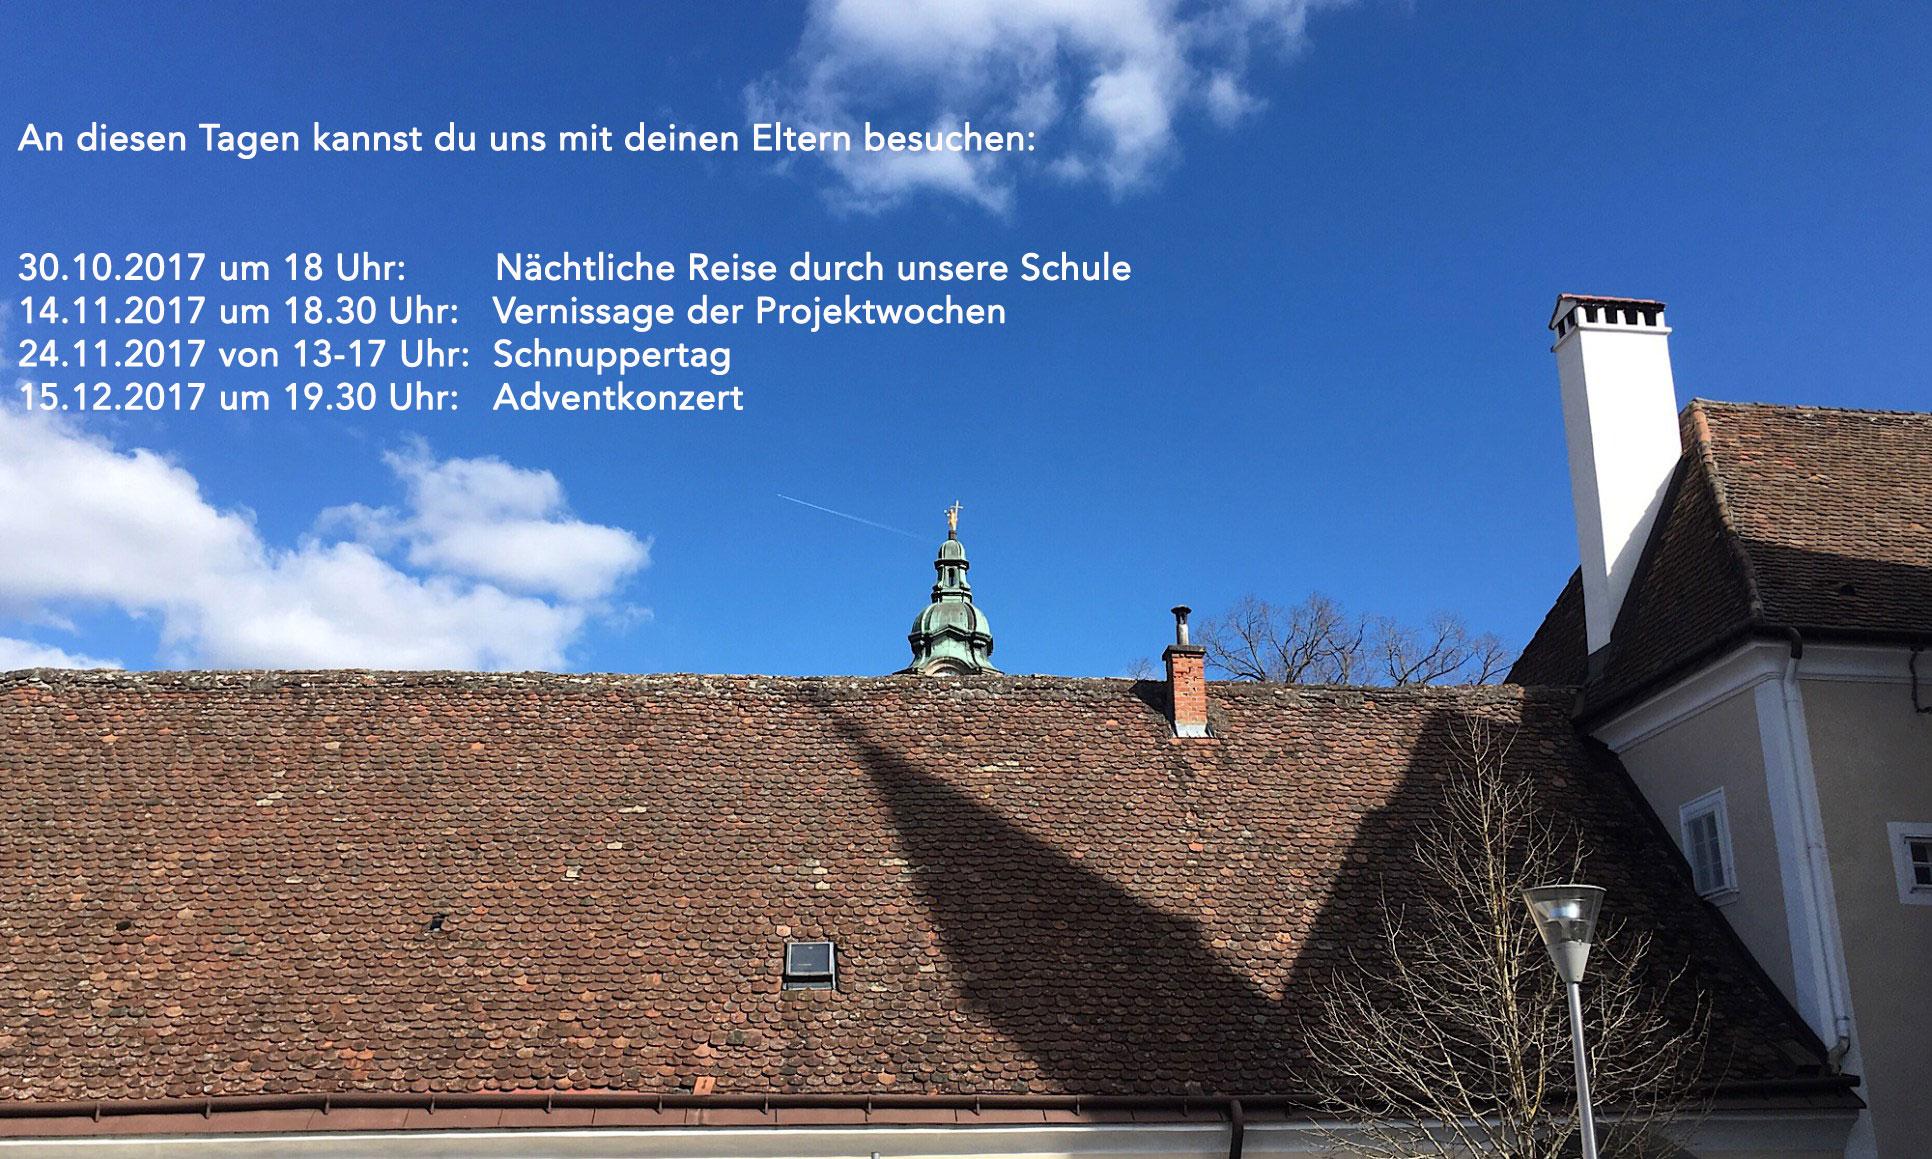 NNÖMS Stift Zwettl